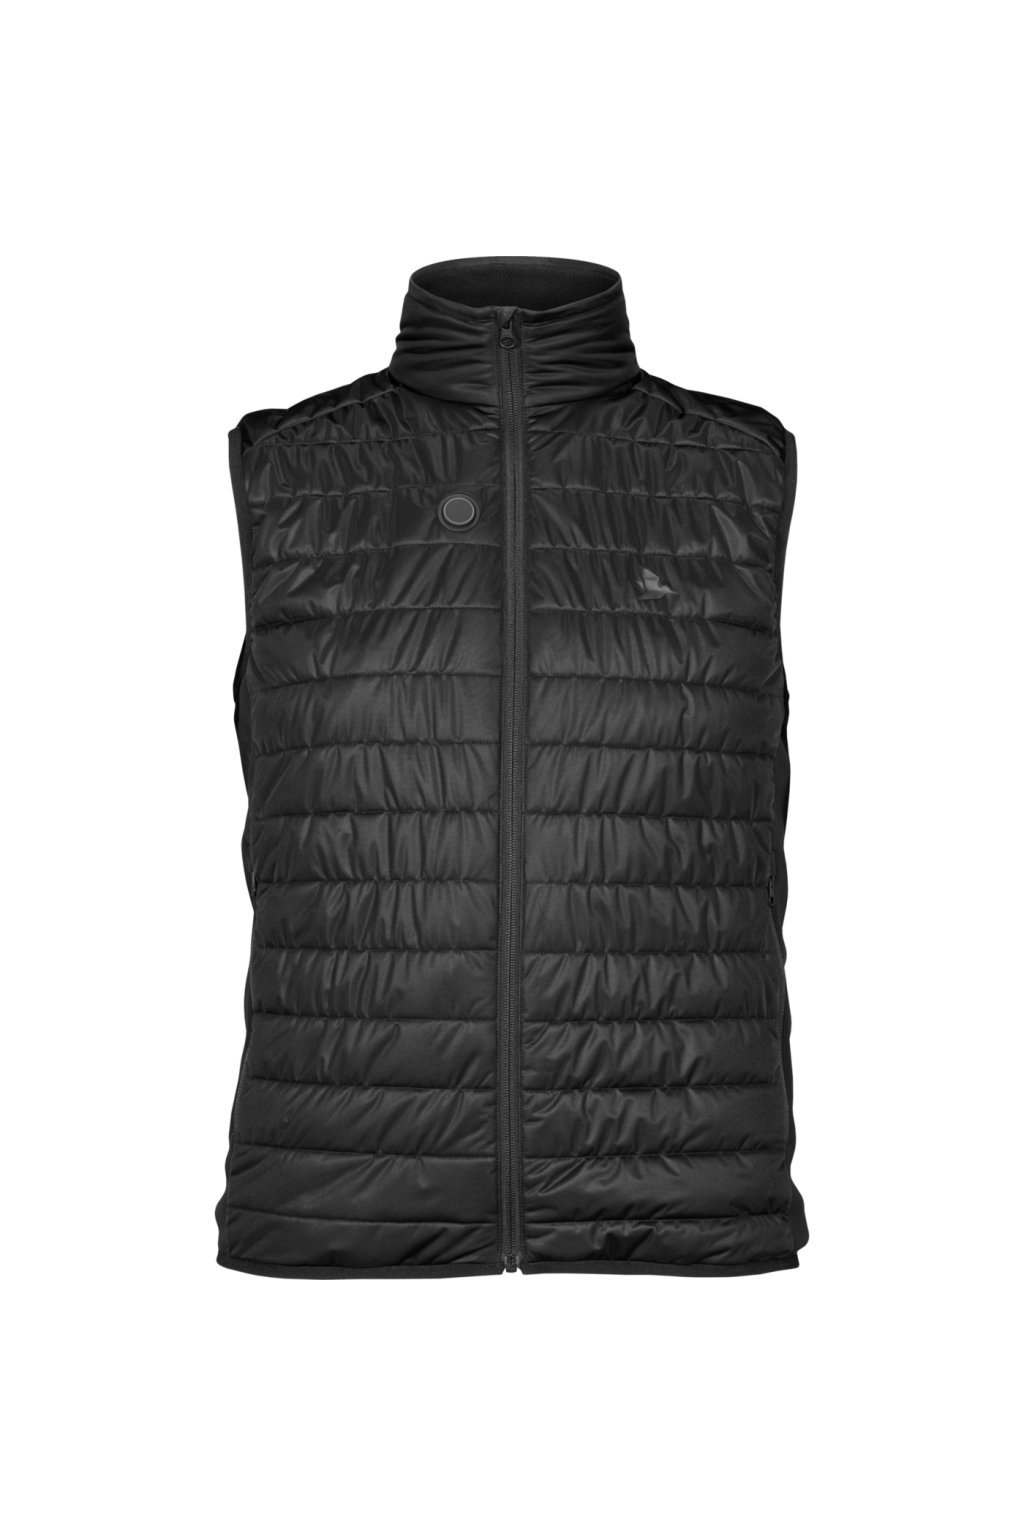 Seeland - Heat vesta unisex vyhřívací